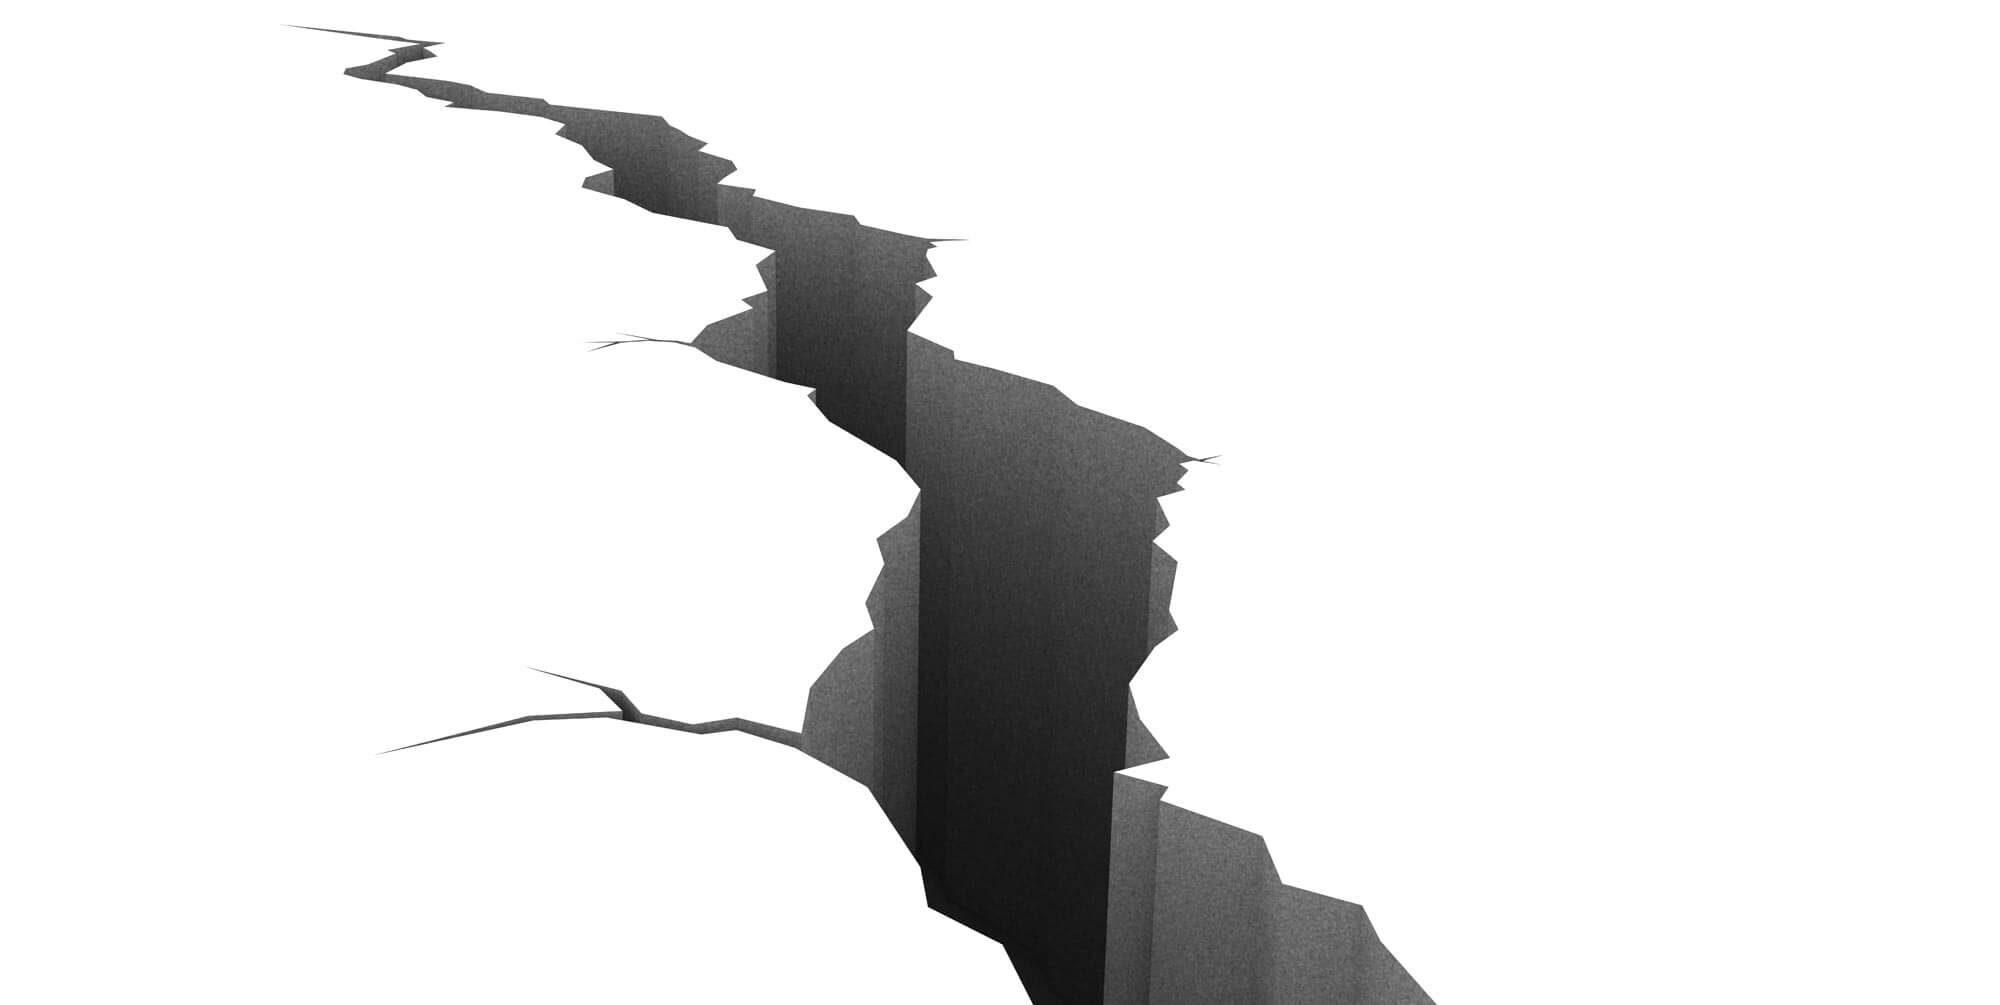 SNW-Earthquake-You-Can-Feel-2000x1005